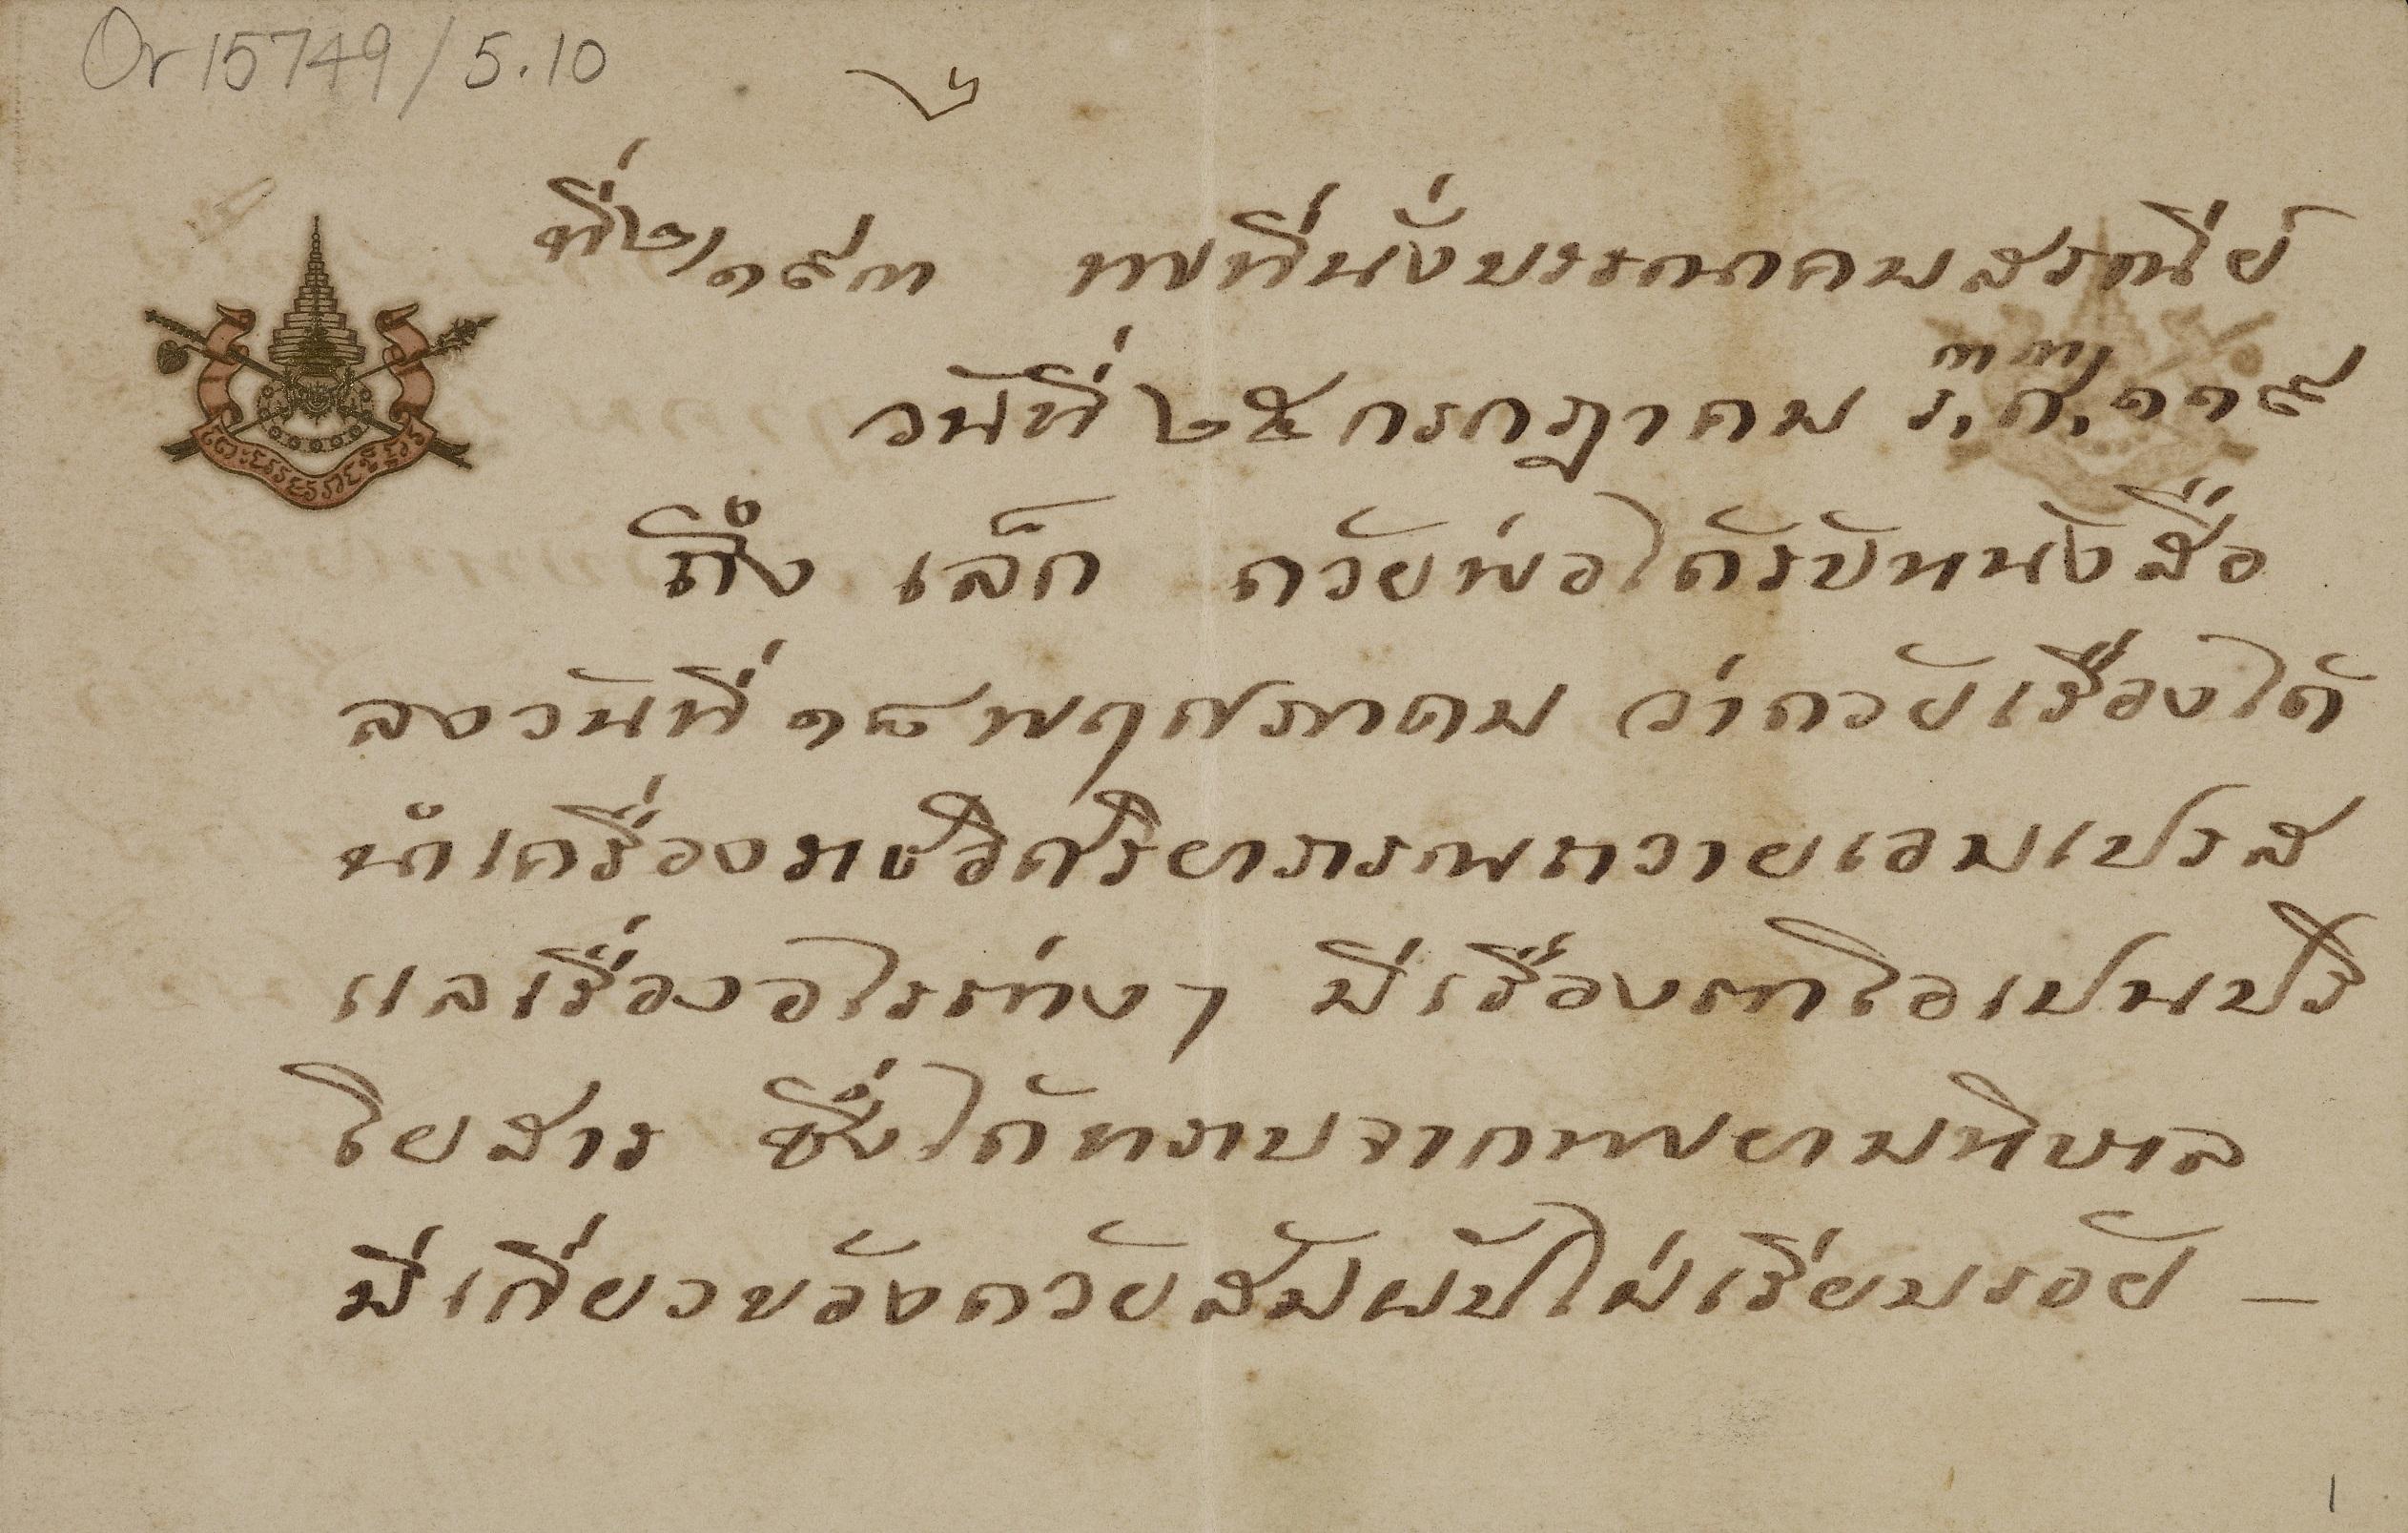 Rama V to Chakrabongse